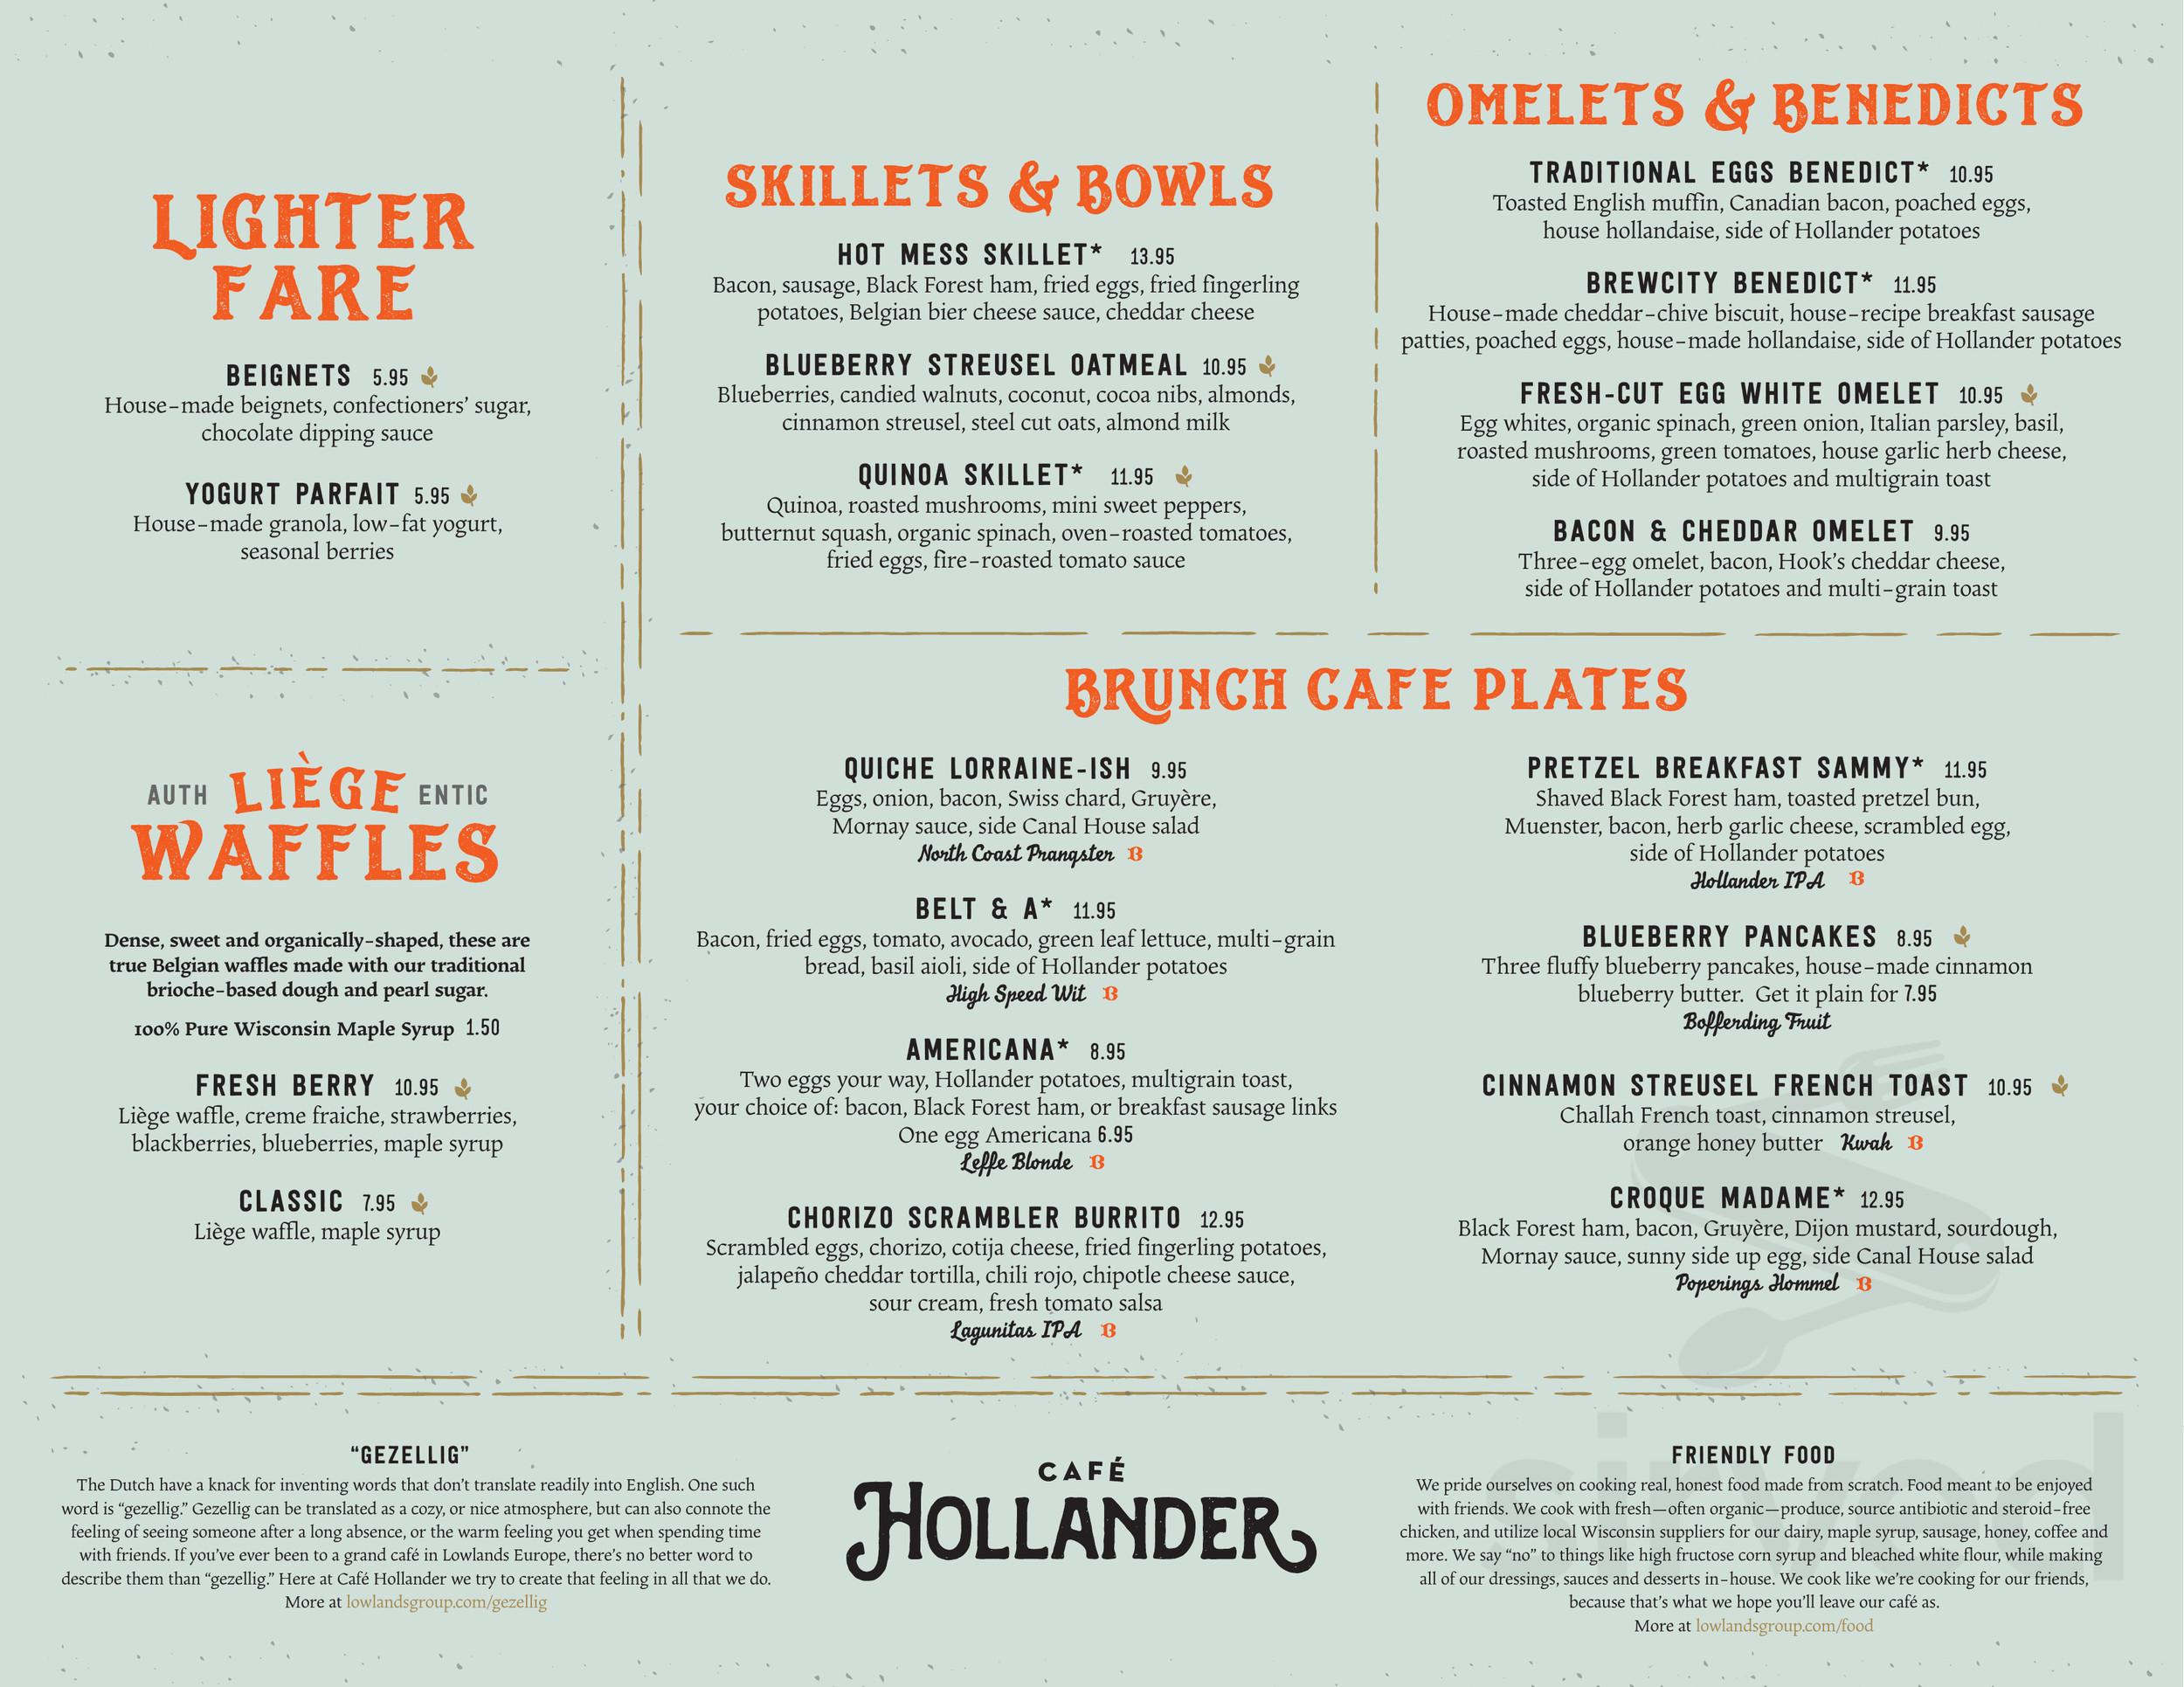 Menu for Café Hollander - Brookfield in Brookfield, Wisconsin